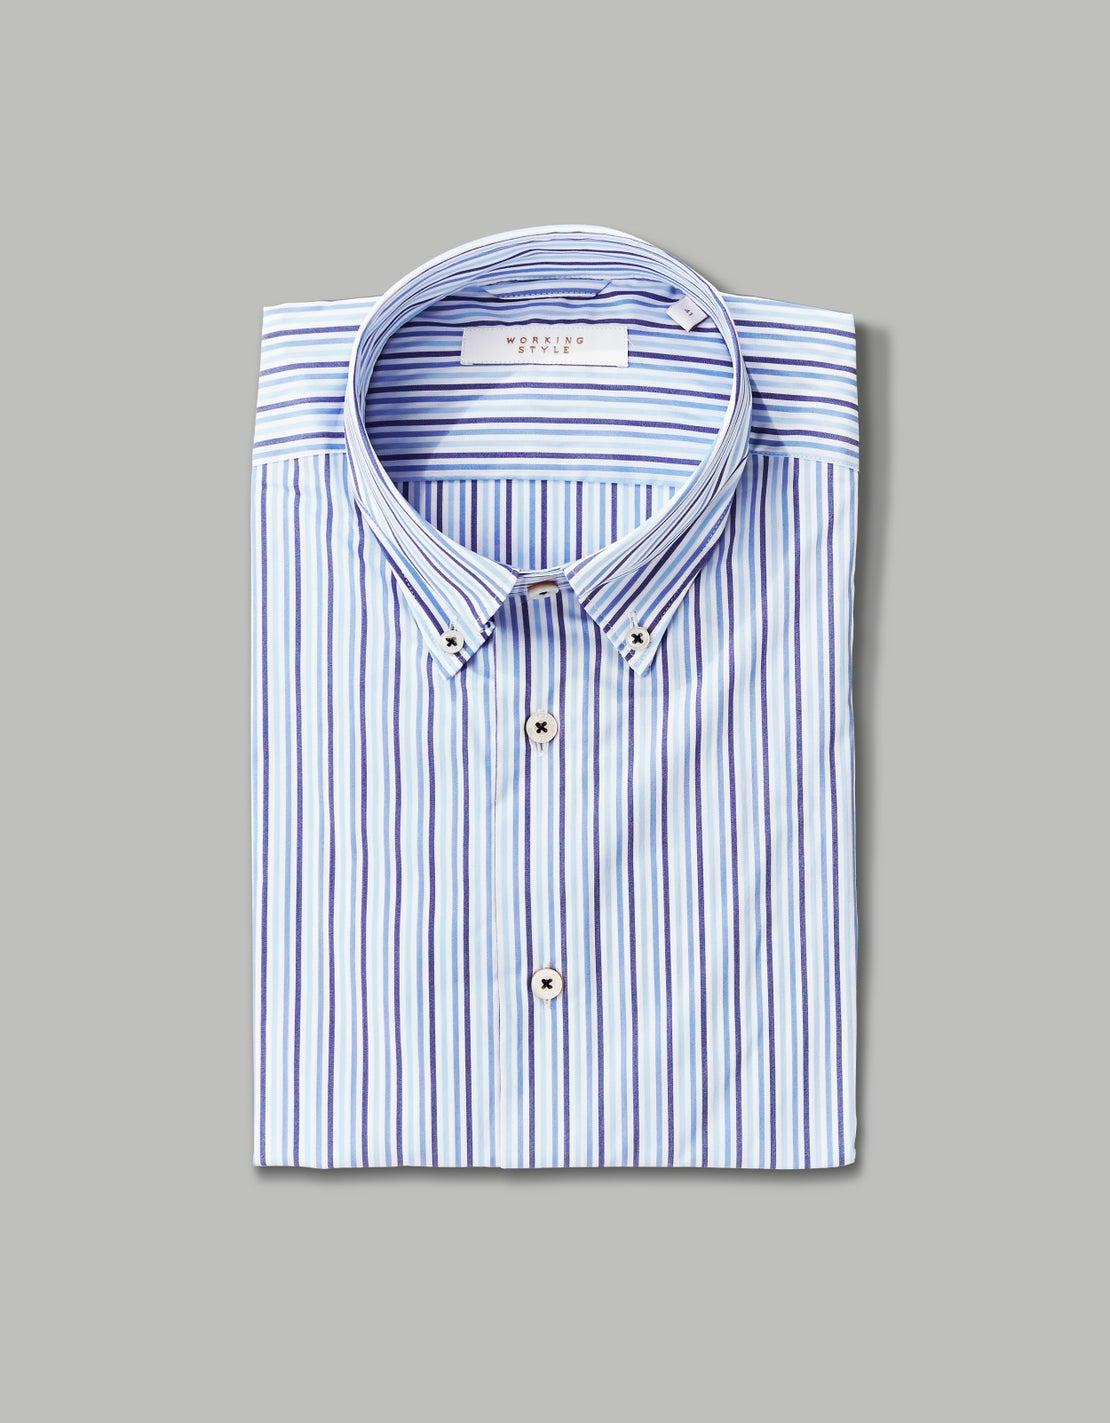 Gradient Blue Stripe Shirt